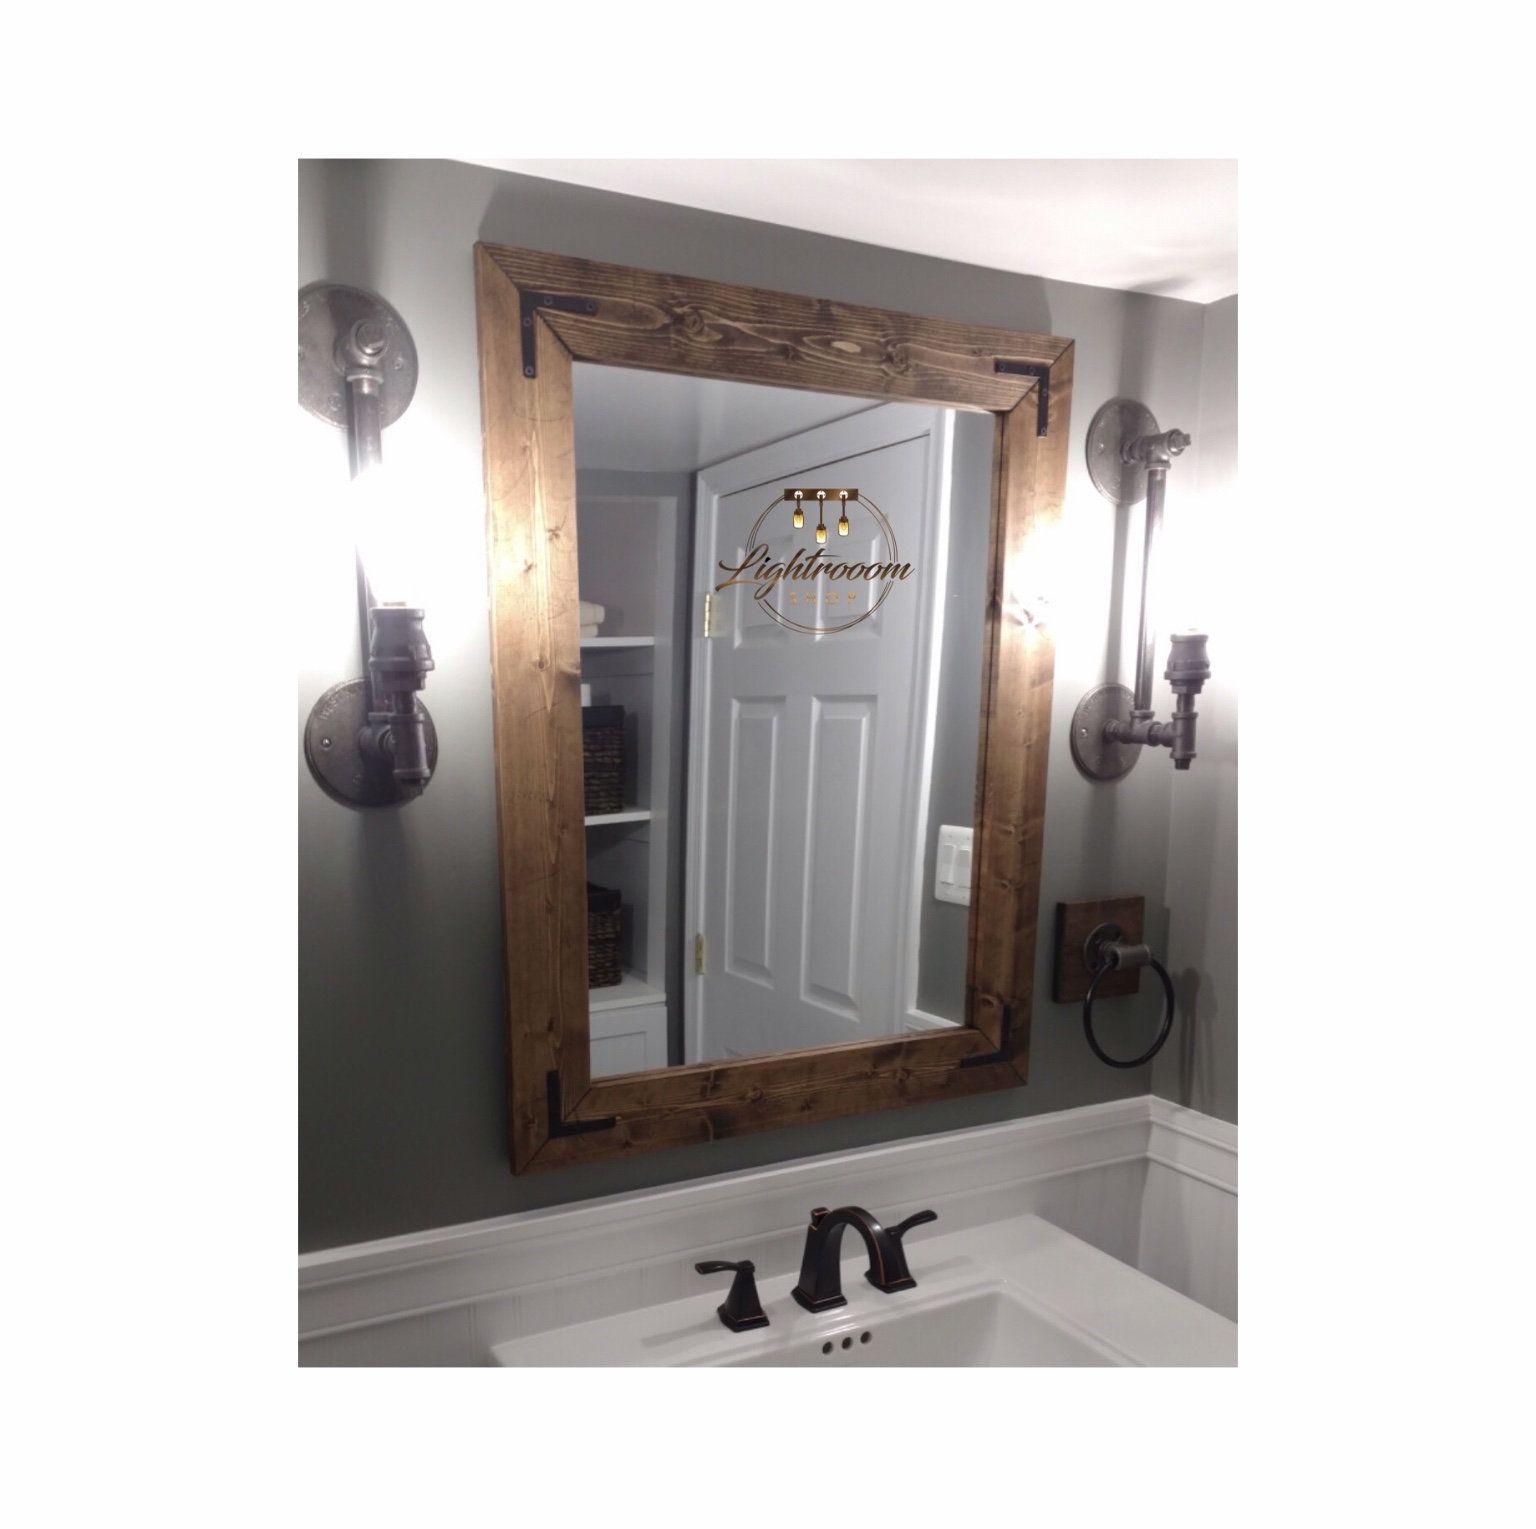 Dark Walnut Mirror, Framed Mirror, Rustic Wood, Bathroom For Walnut Wood Wall Mirrors (View 19 of 20)